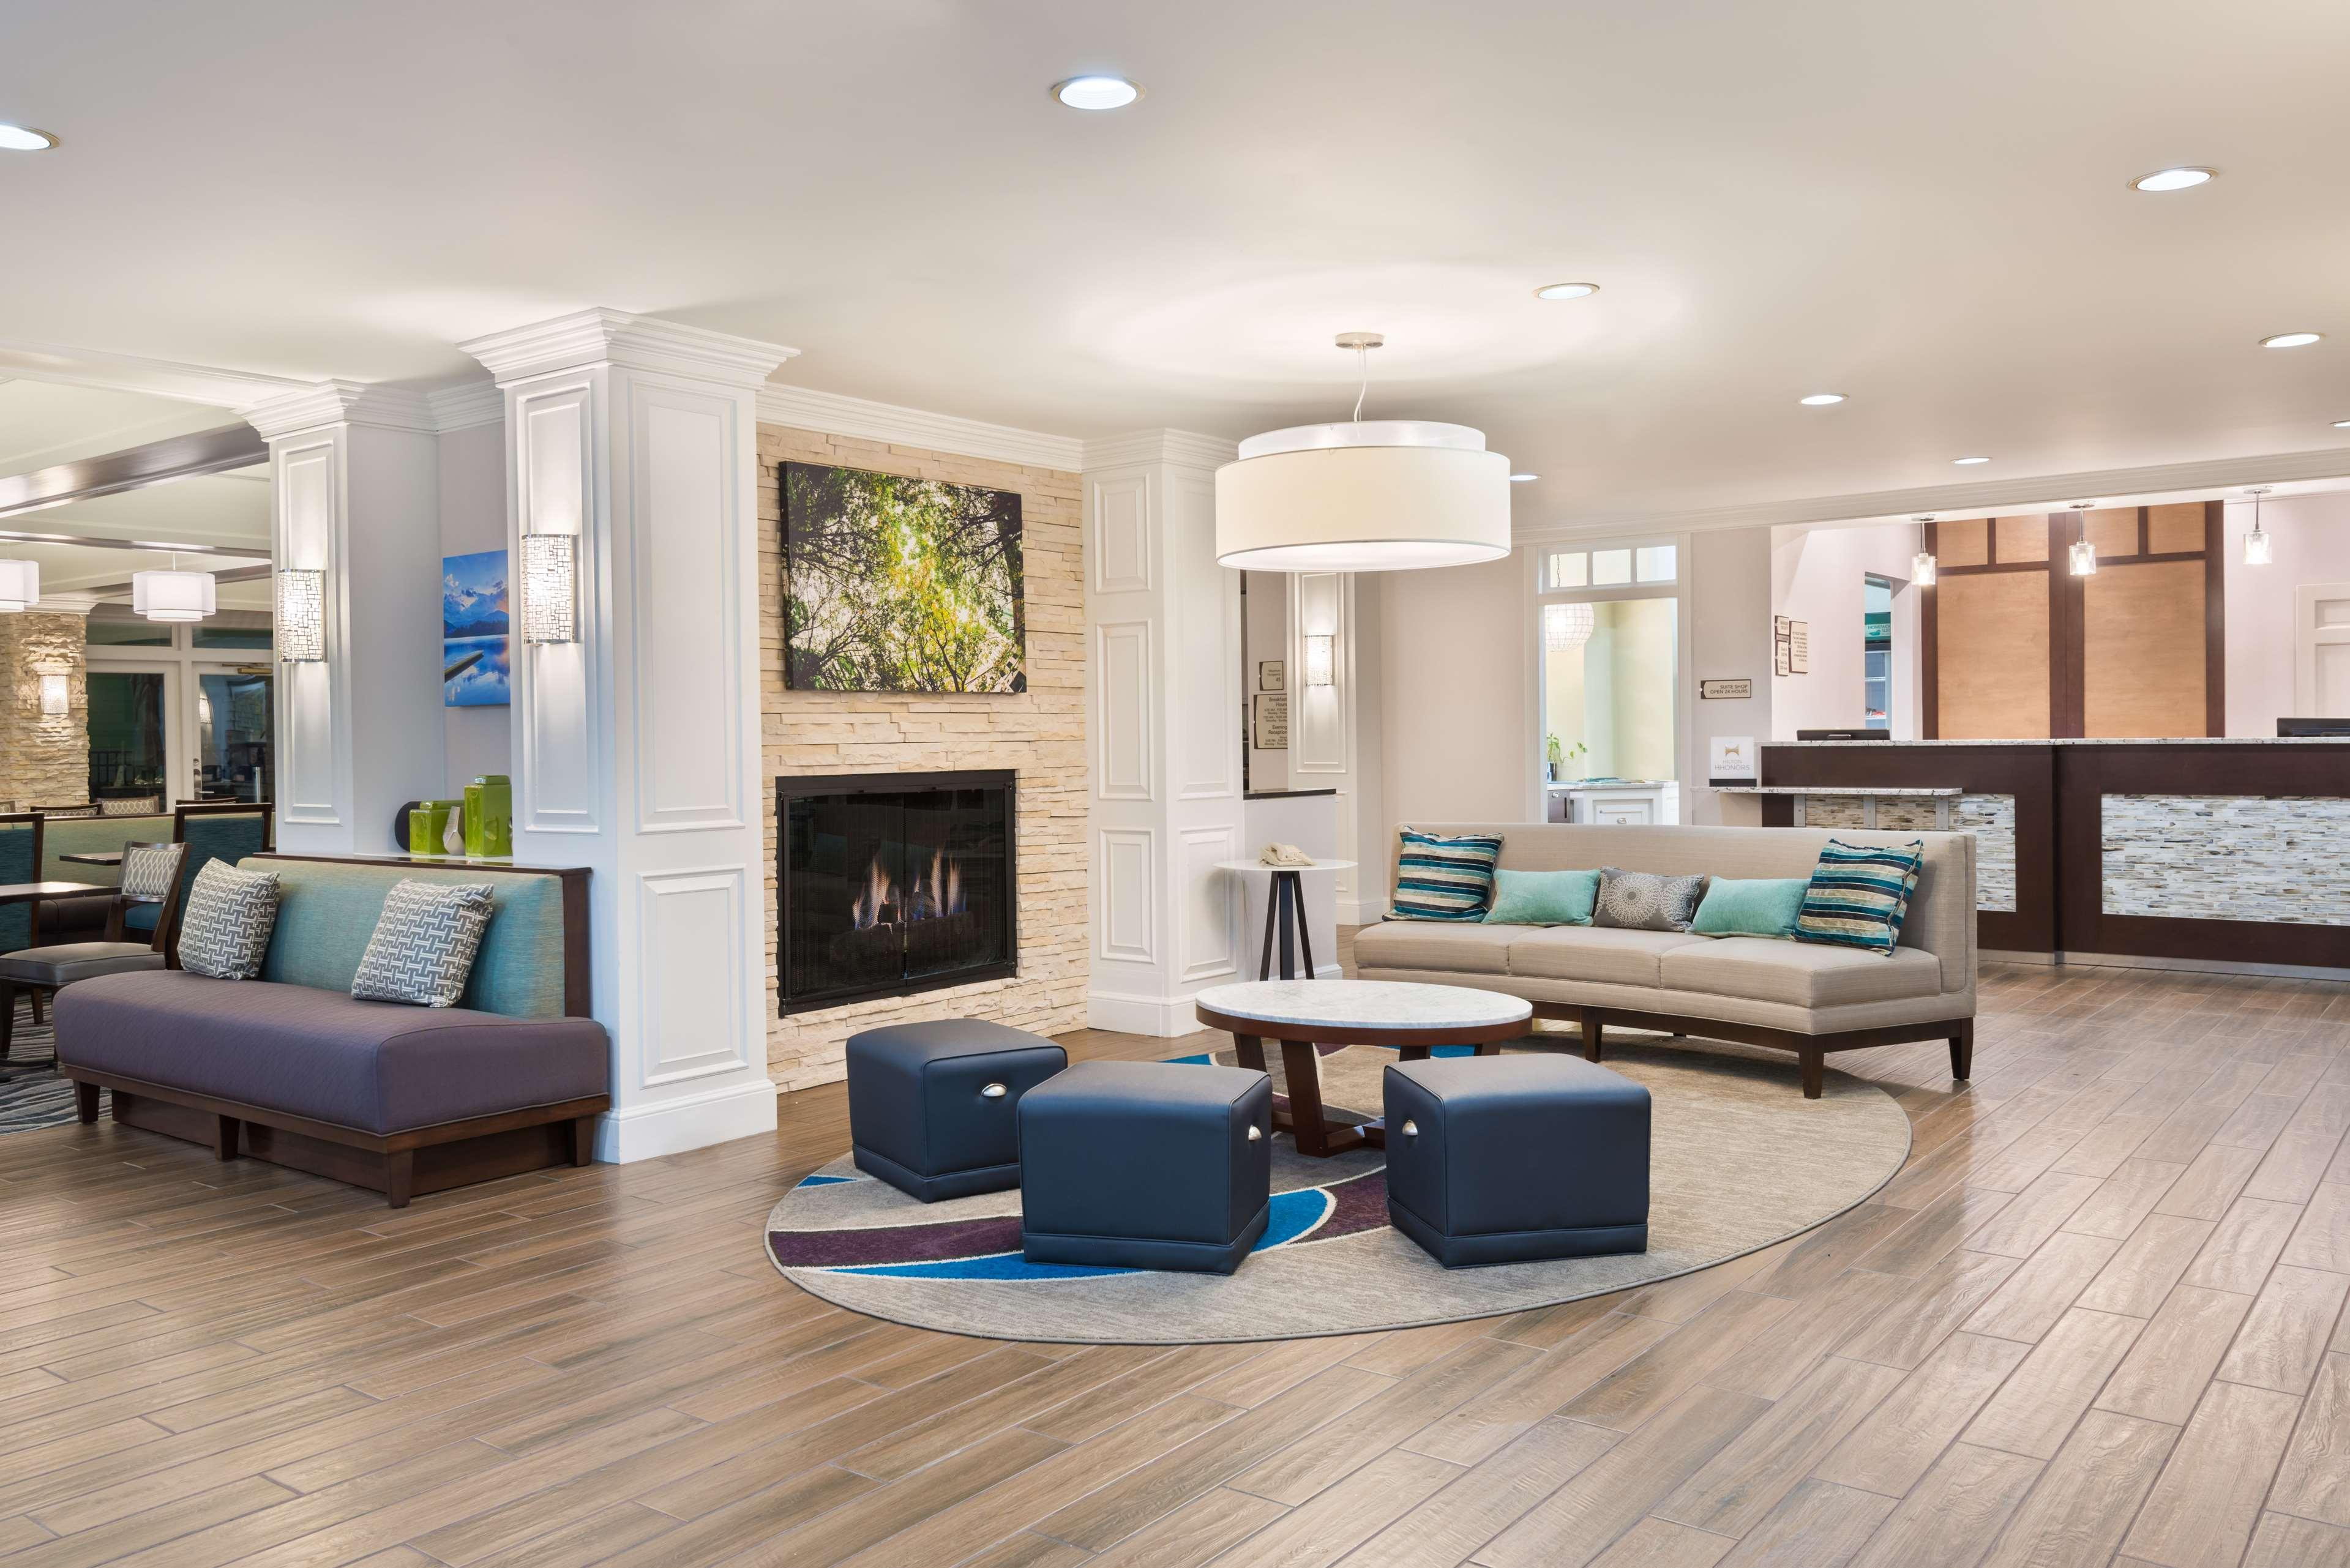 Homewood Suites by Hilton Charlotte-North/Univ Research Park image 3